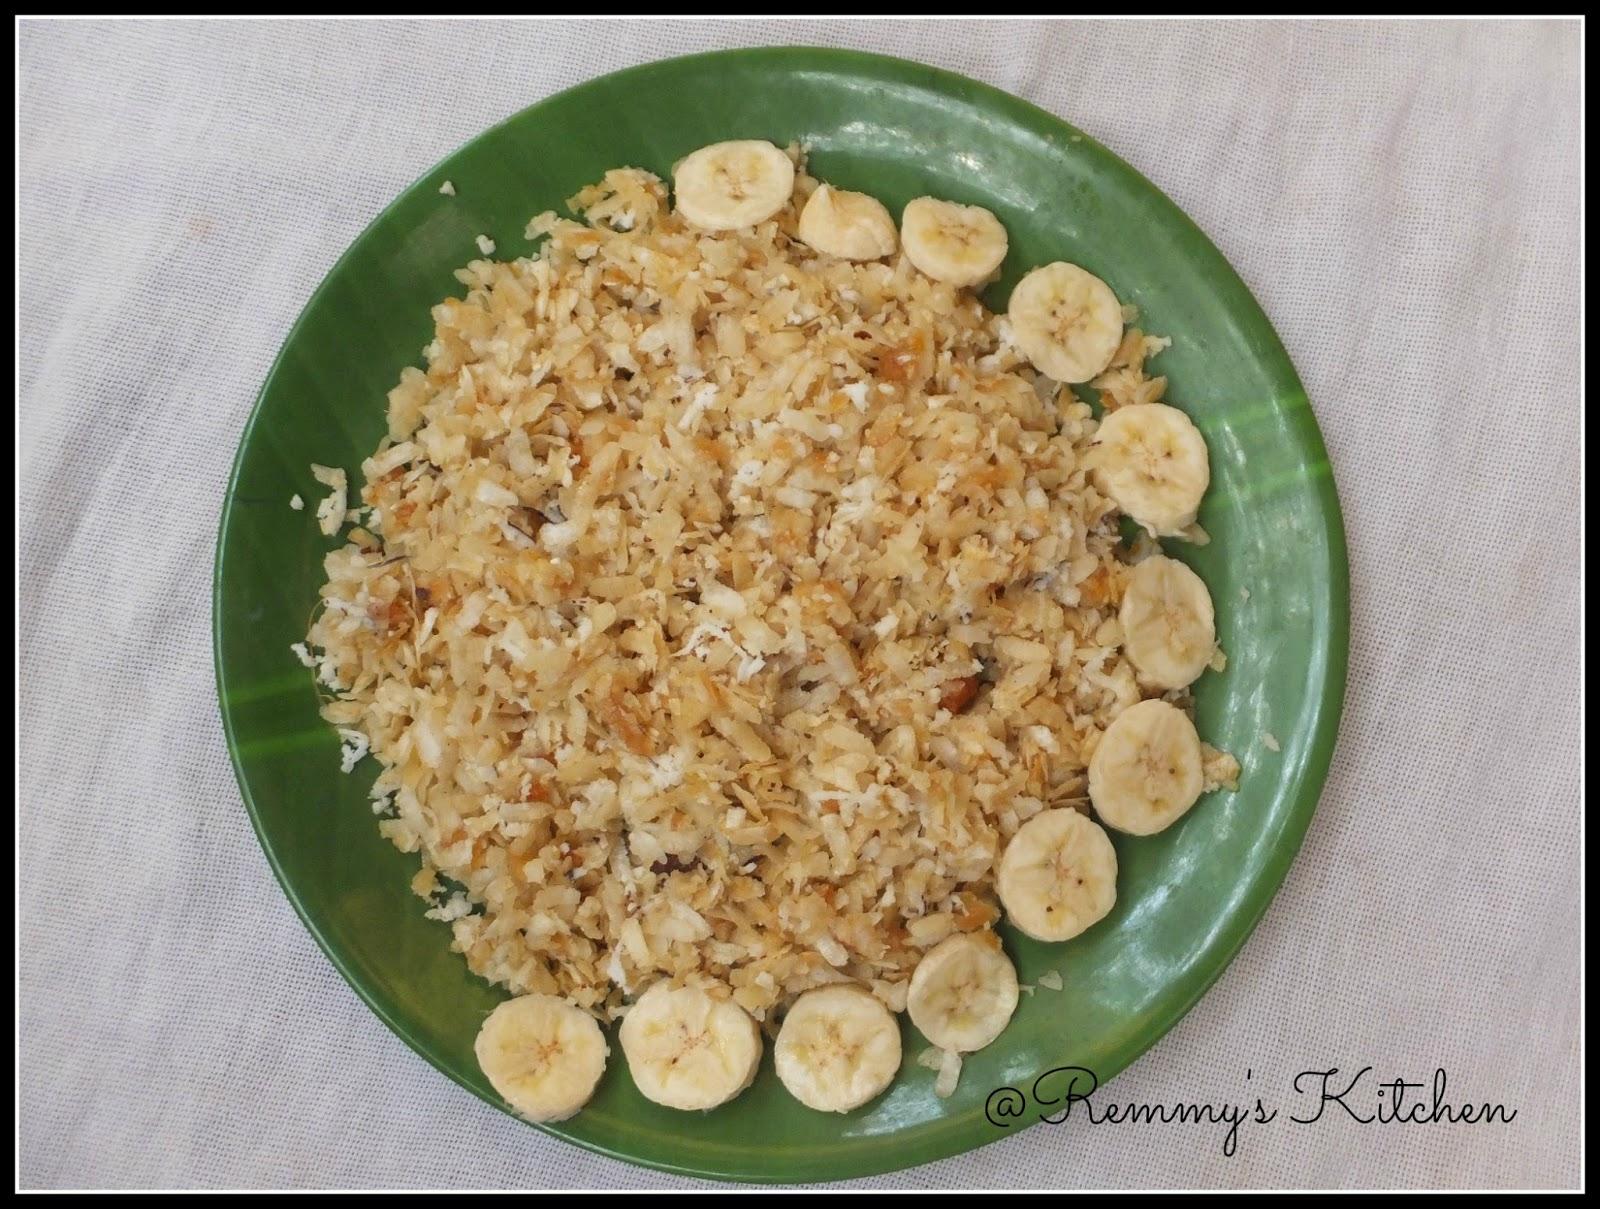 Aval nanachathu / Sweetend rice flakes